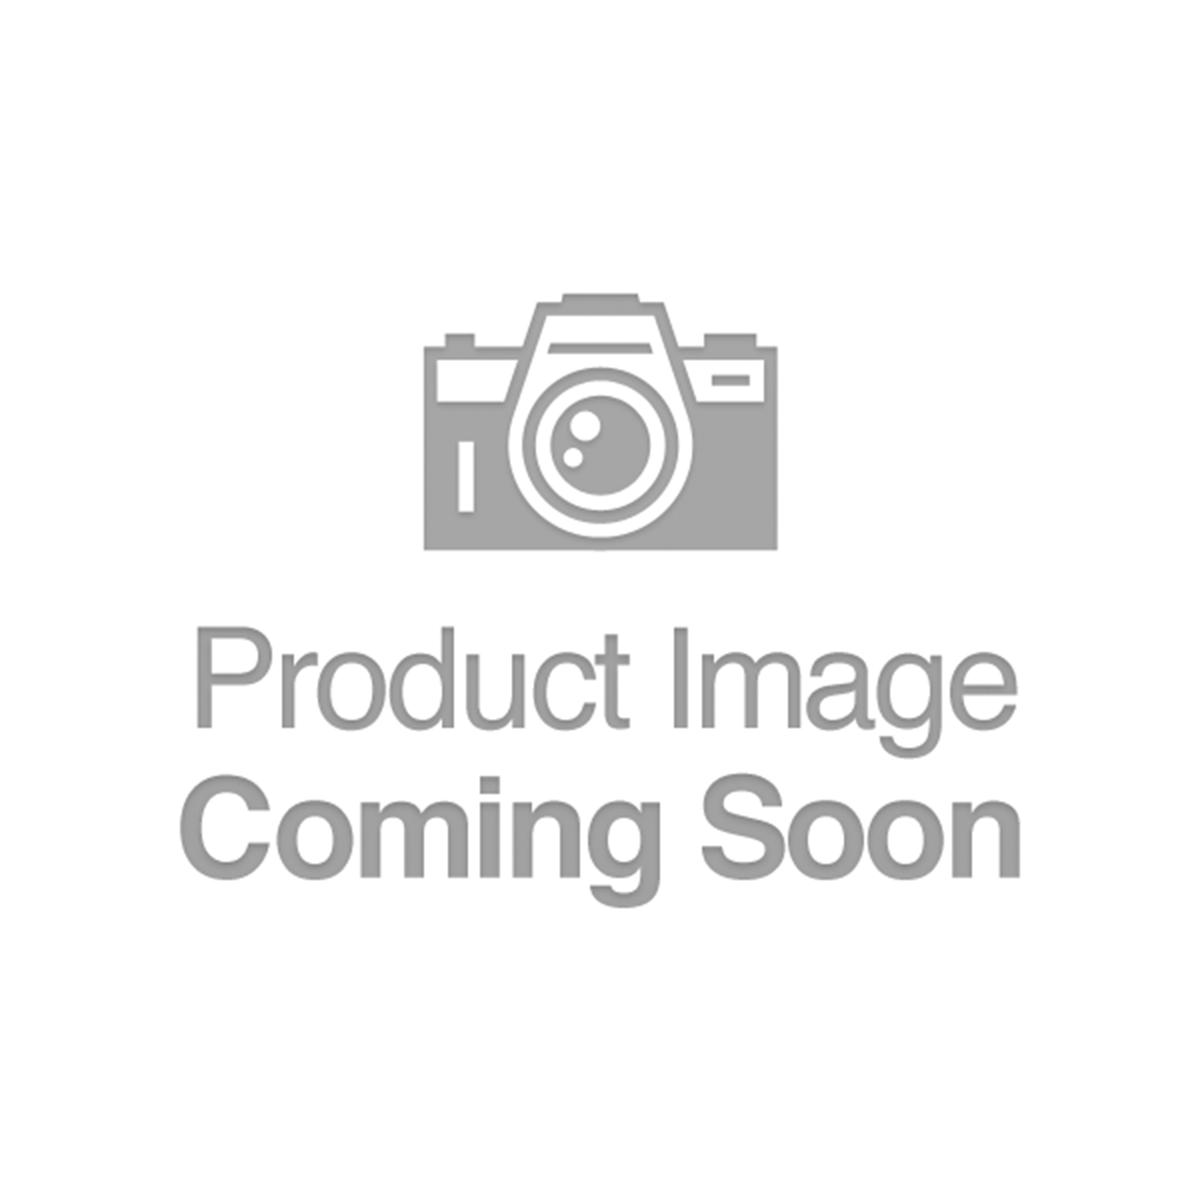 Alexandria - Virginia - CH 1716 - FR 645 - VF